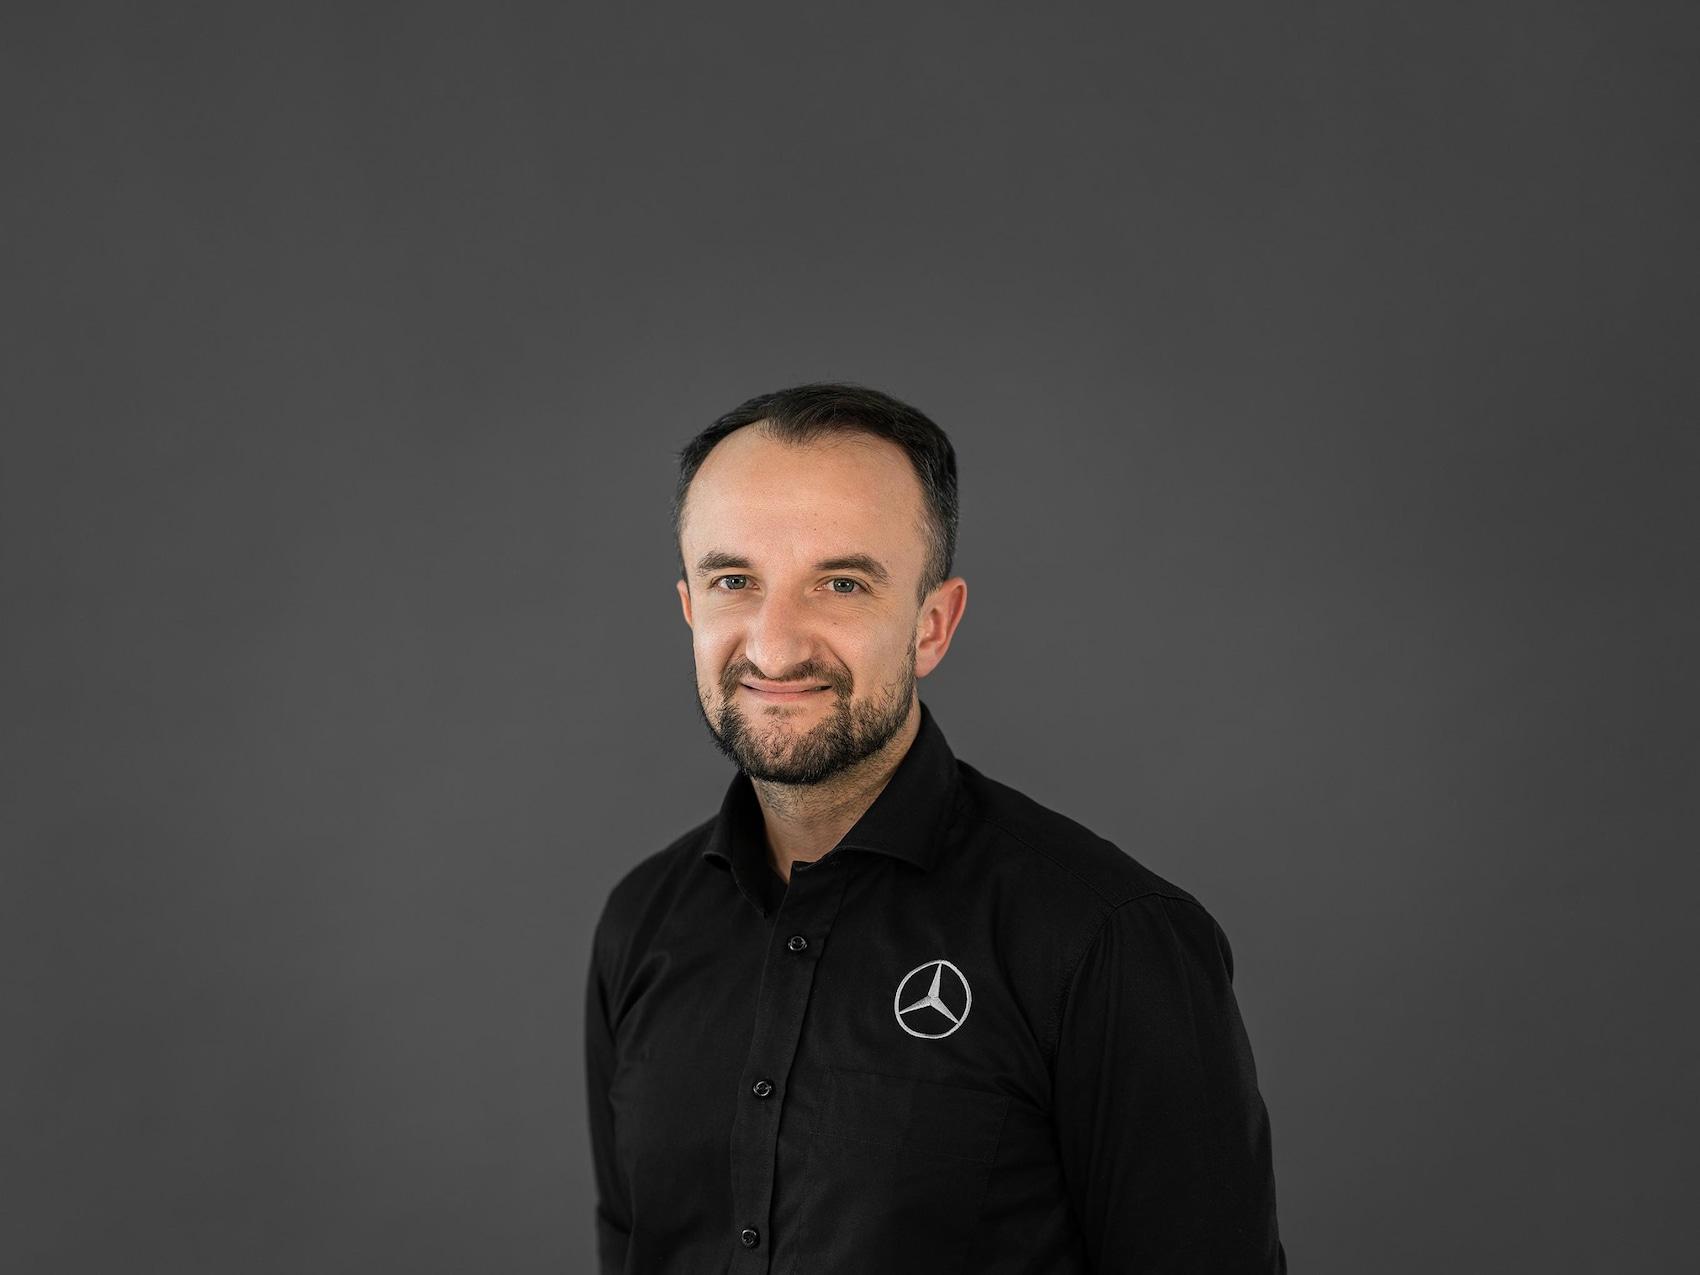 Juri Saizew, Autohaus Lehr